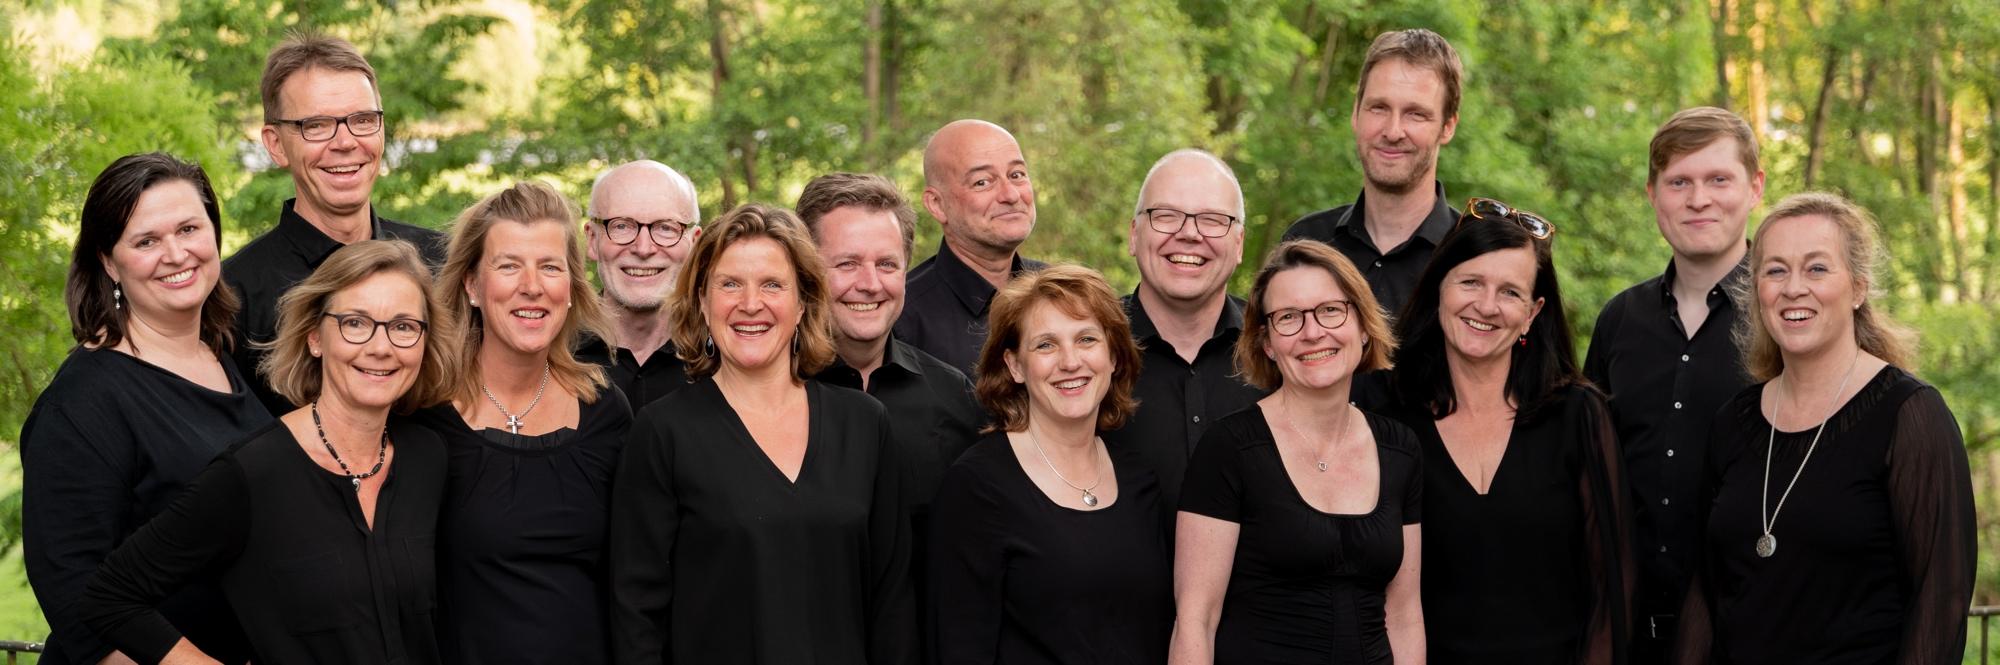 Enno Kinast Bariton Bass Münster Haltern am See Out of School Ensemble Stimmbildung Solist Gesangsunterricht Gesang